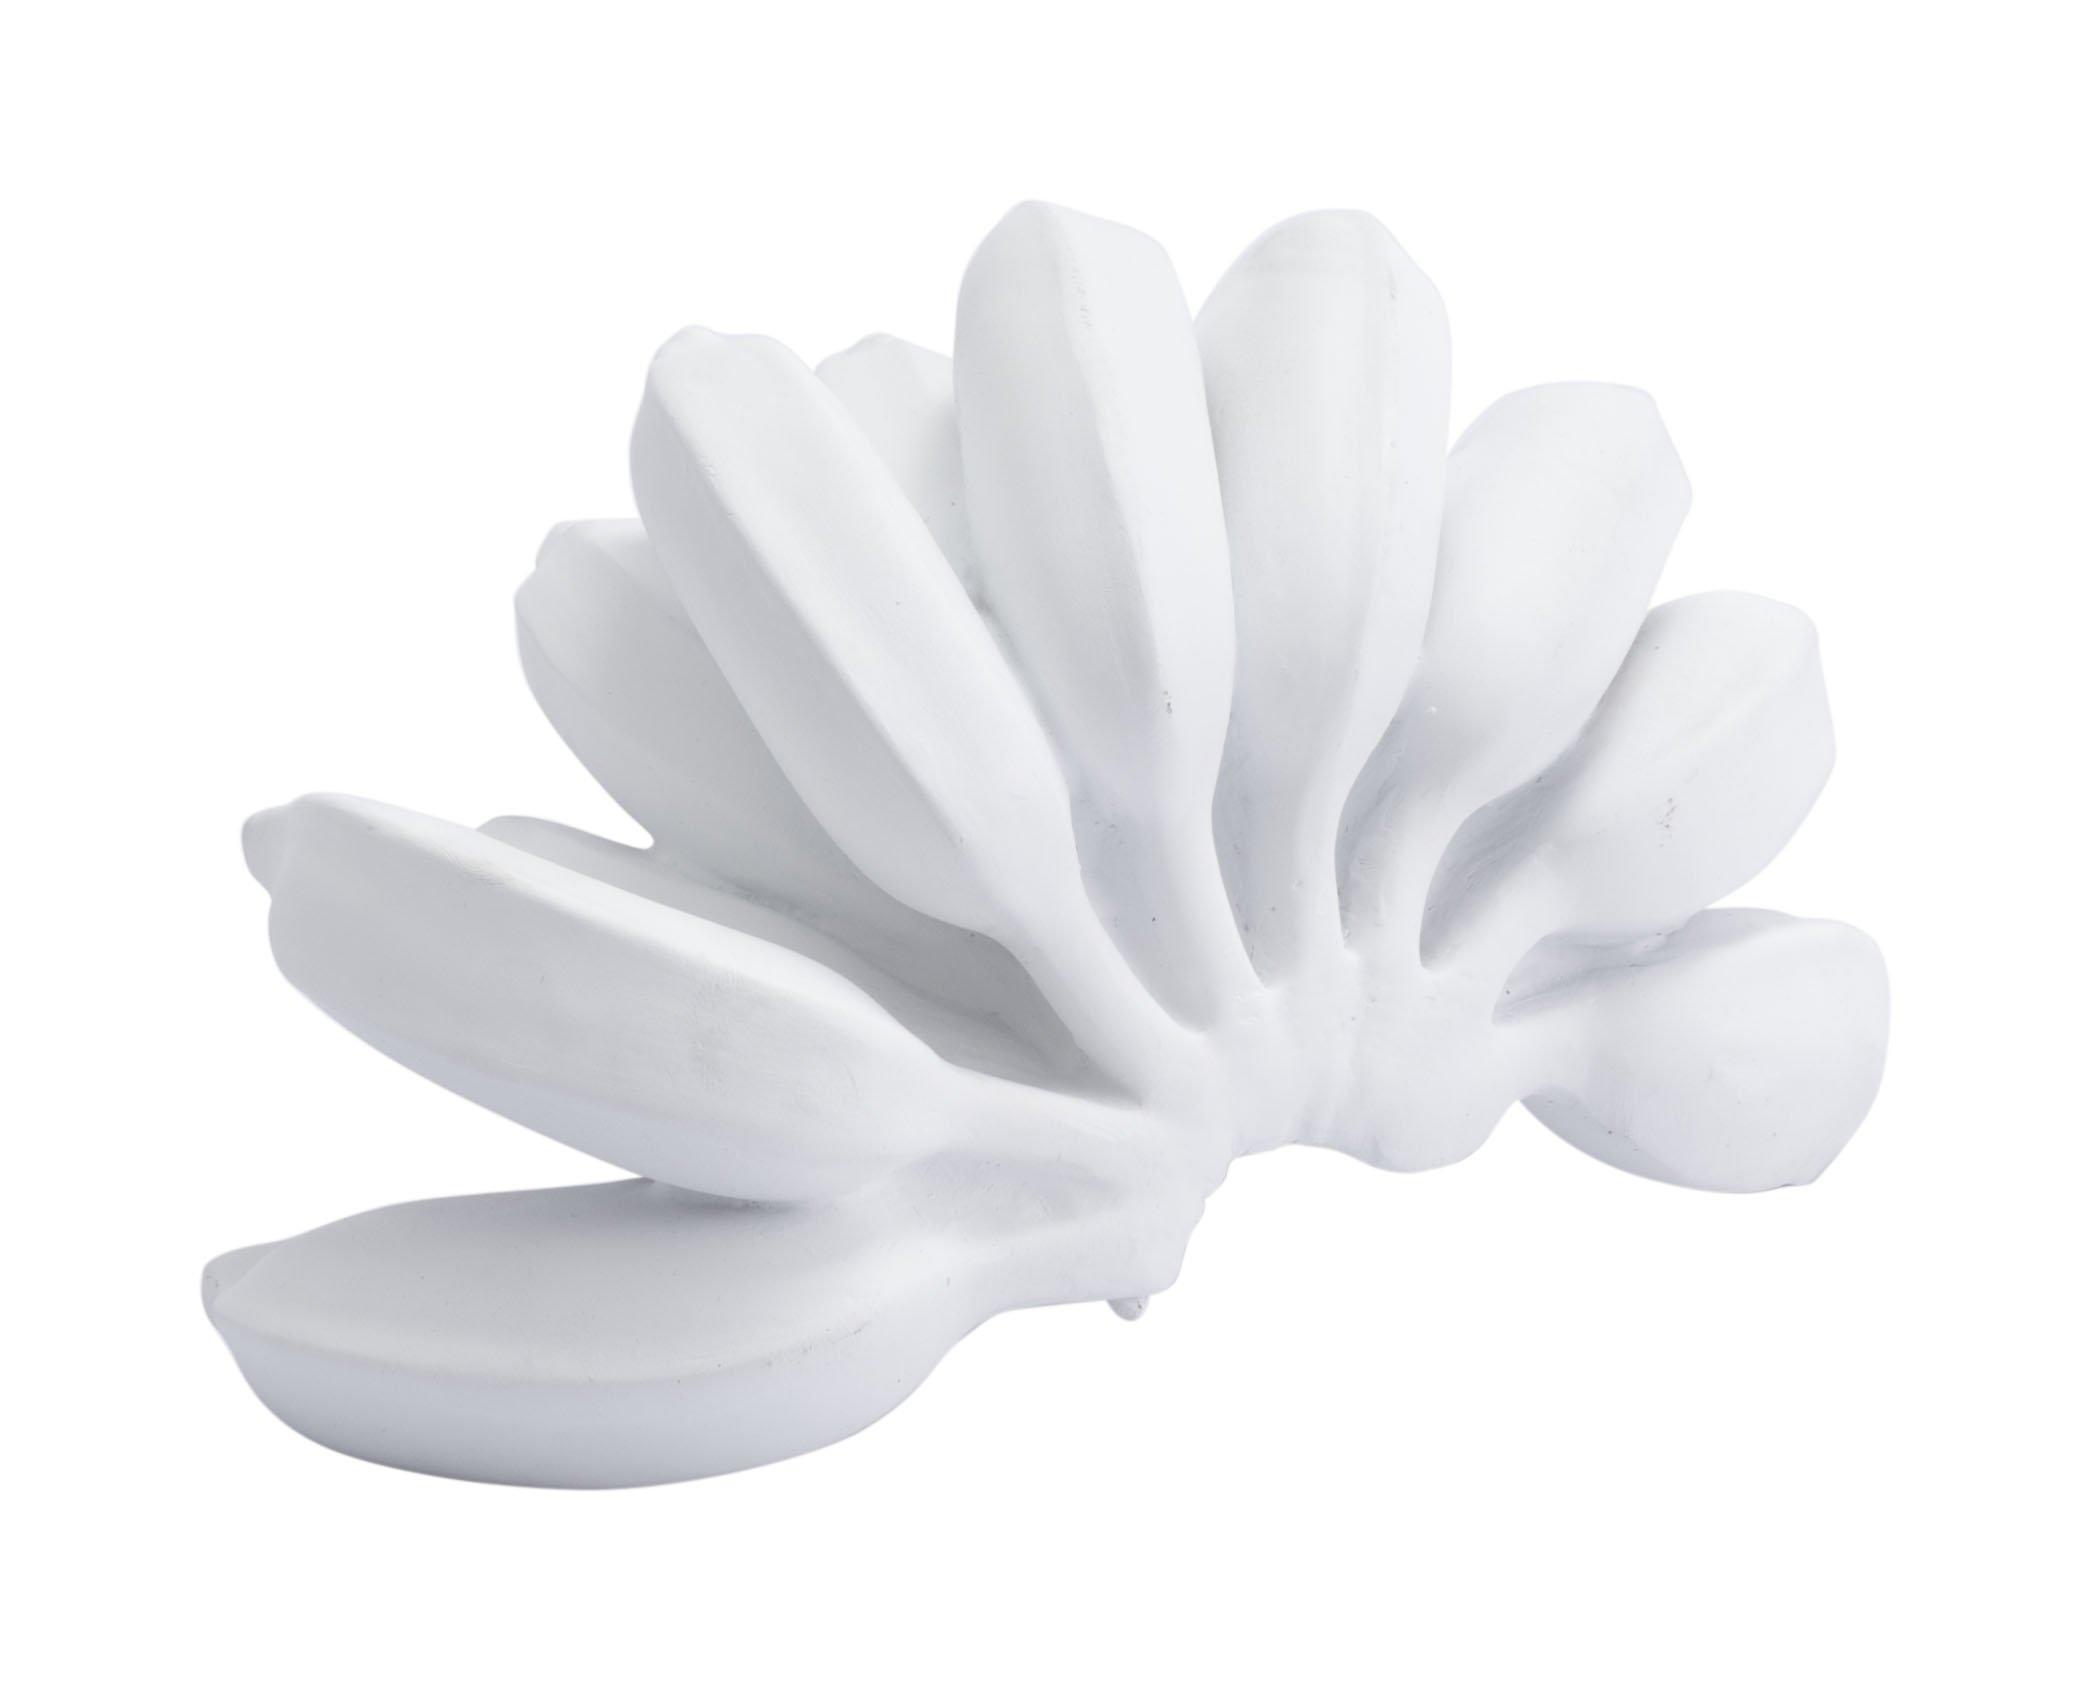 Zuo Bananas Bowl Decor Figurine, White by Zuo Modern